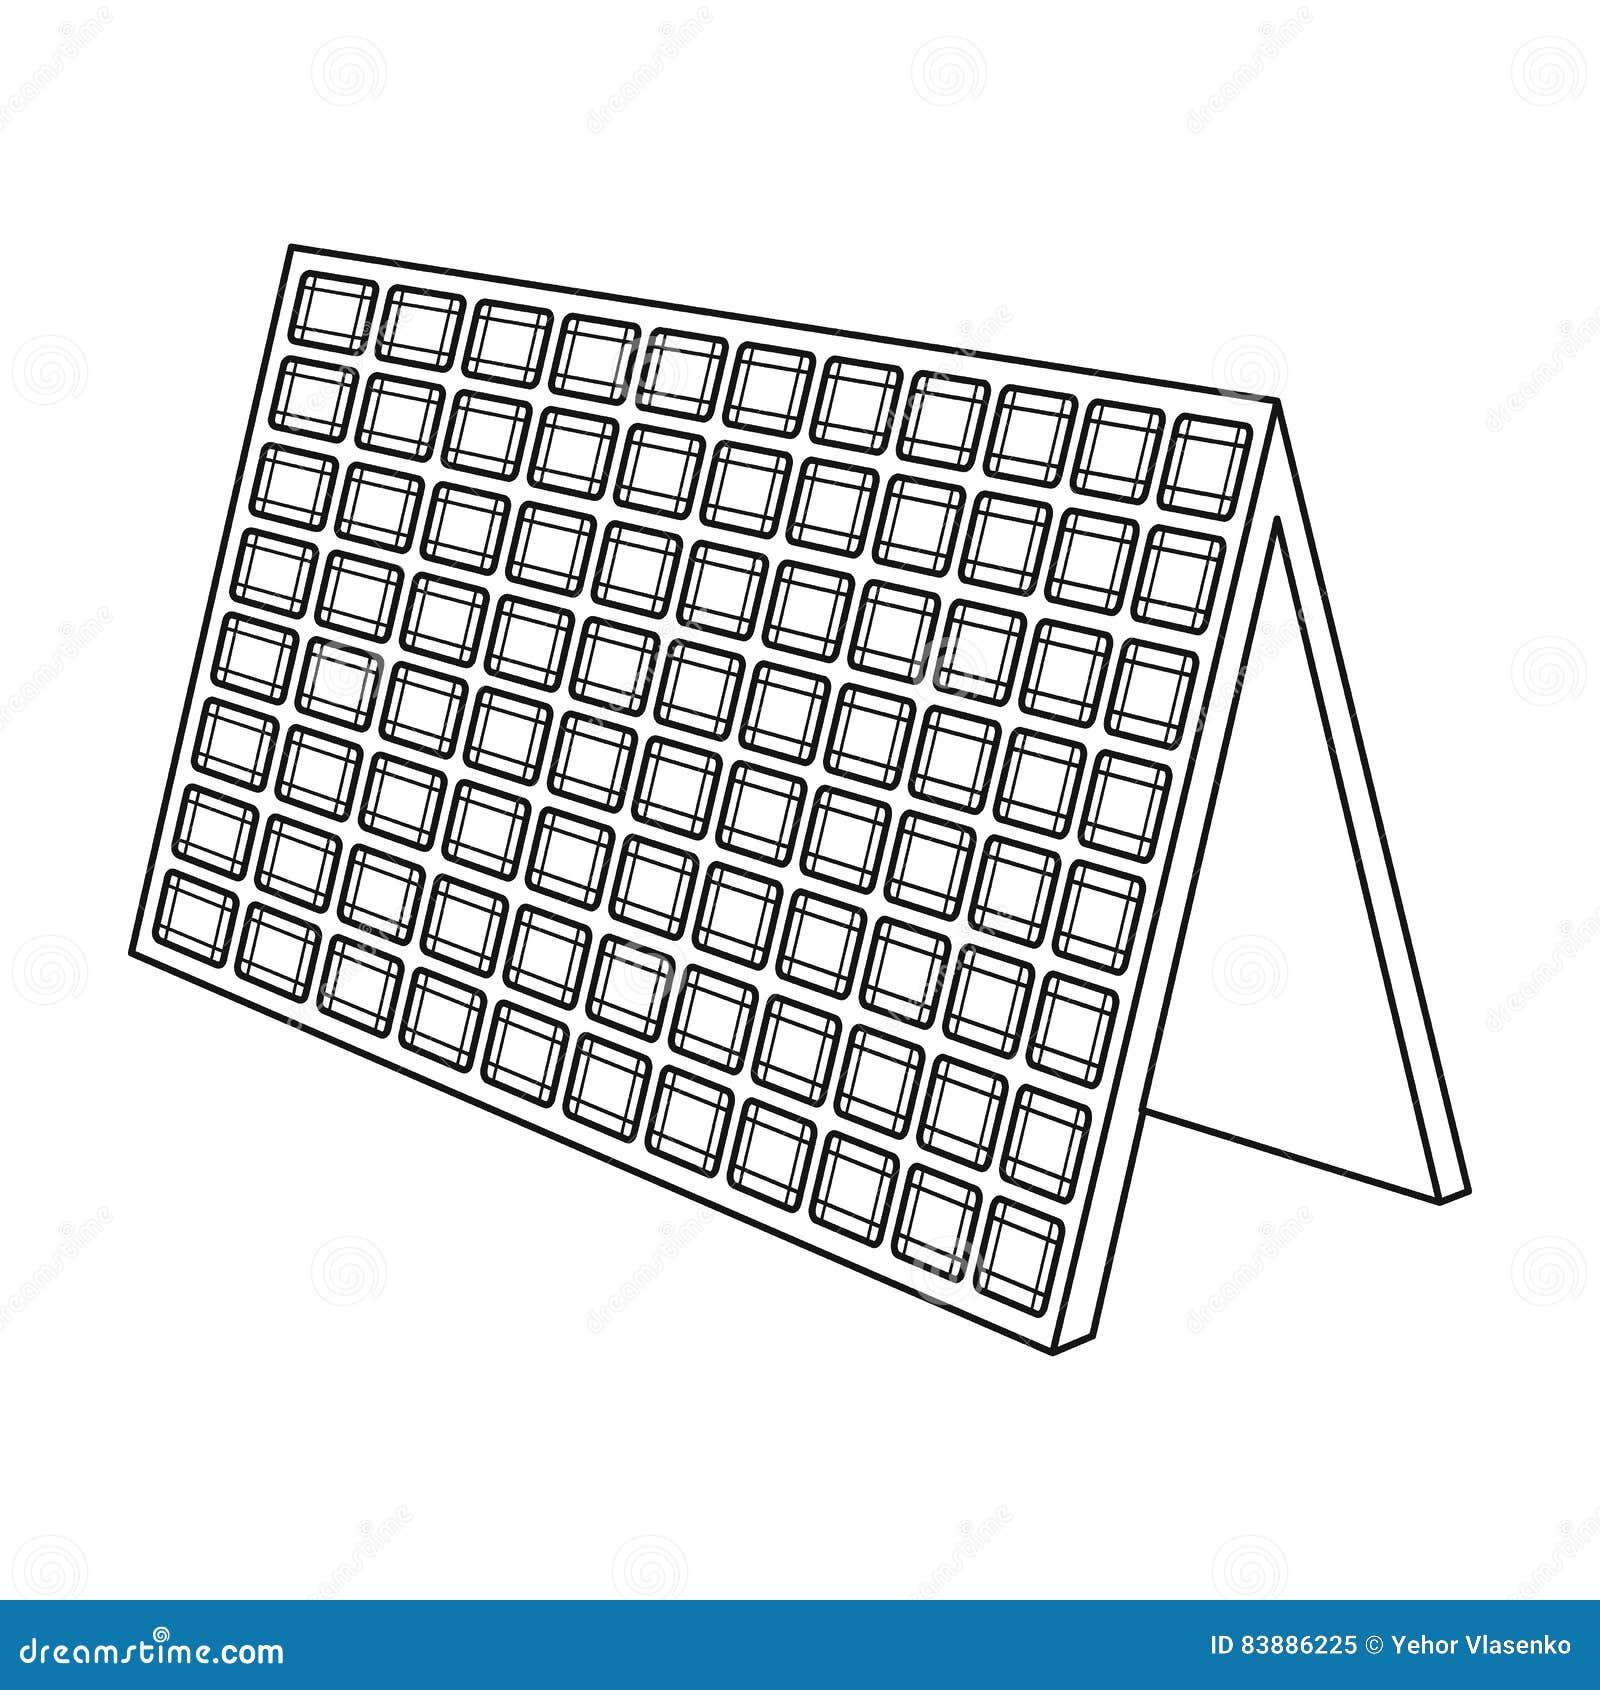 solar panel illustration royalty